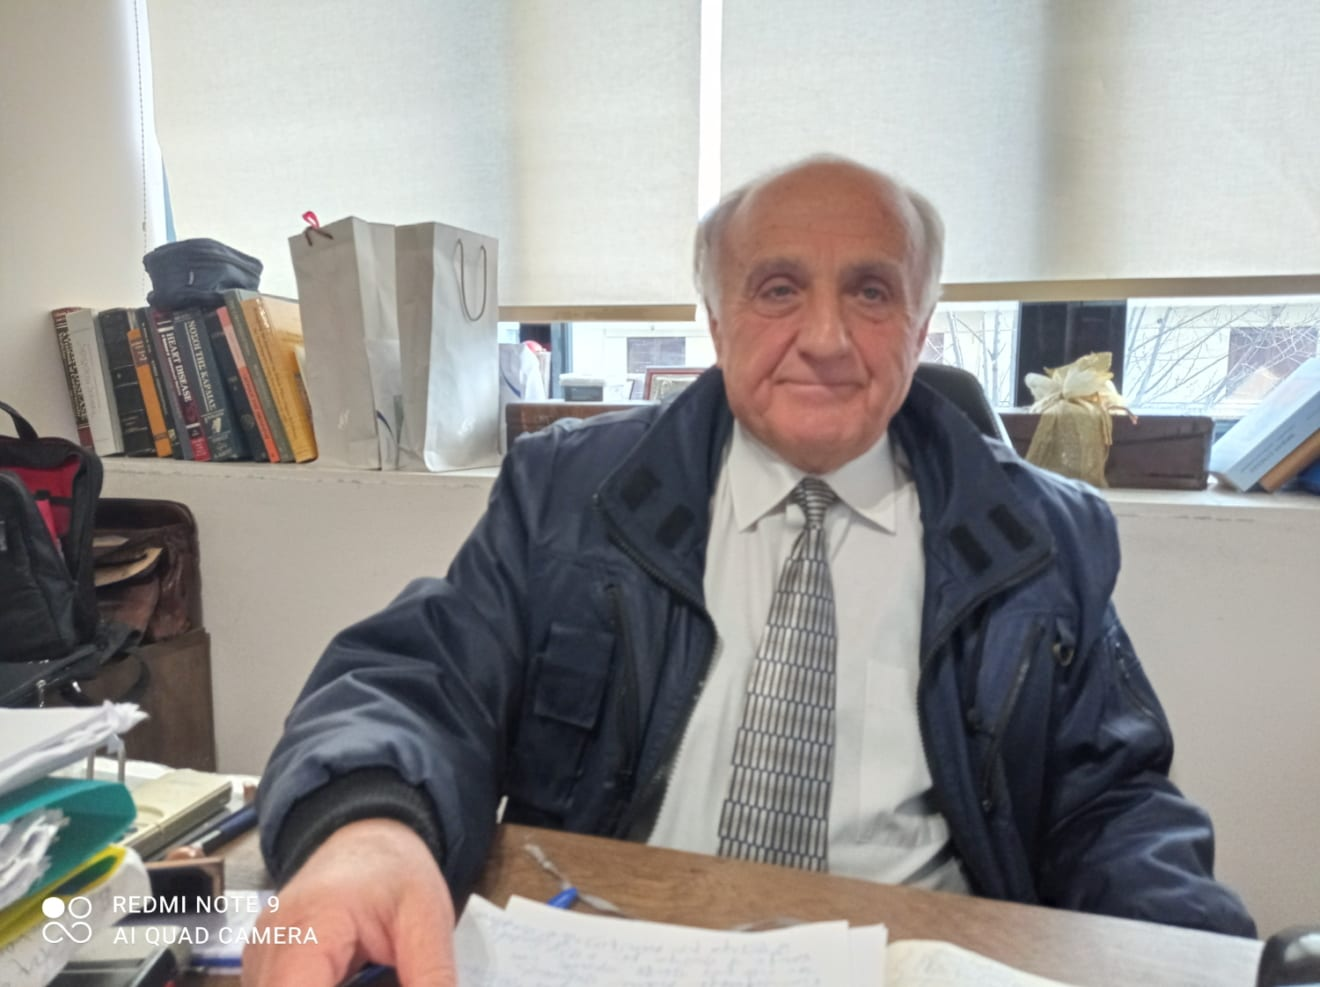 { COVID 19 } Ιατρός Ανδρέας Γιαννουλόπουλος : Προκαλούμε και προσκαλούμε σε δημόσιο ανοιχτό διάλογο κυβέρνηση και αρμοδίους!